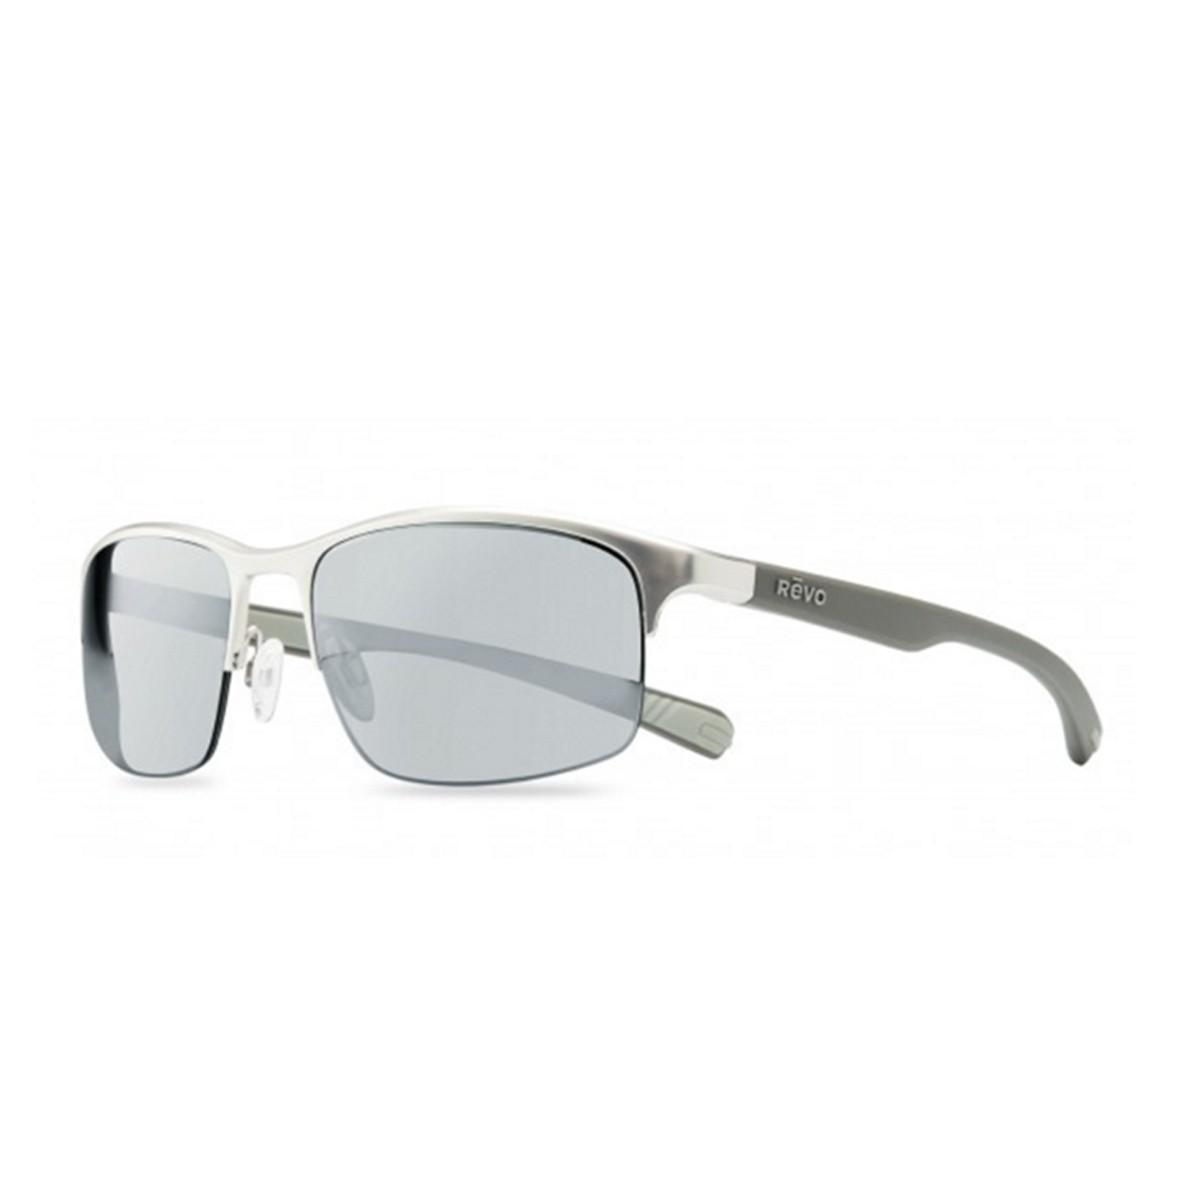 Revo RE 1016   Men's sunglasses